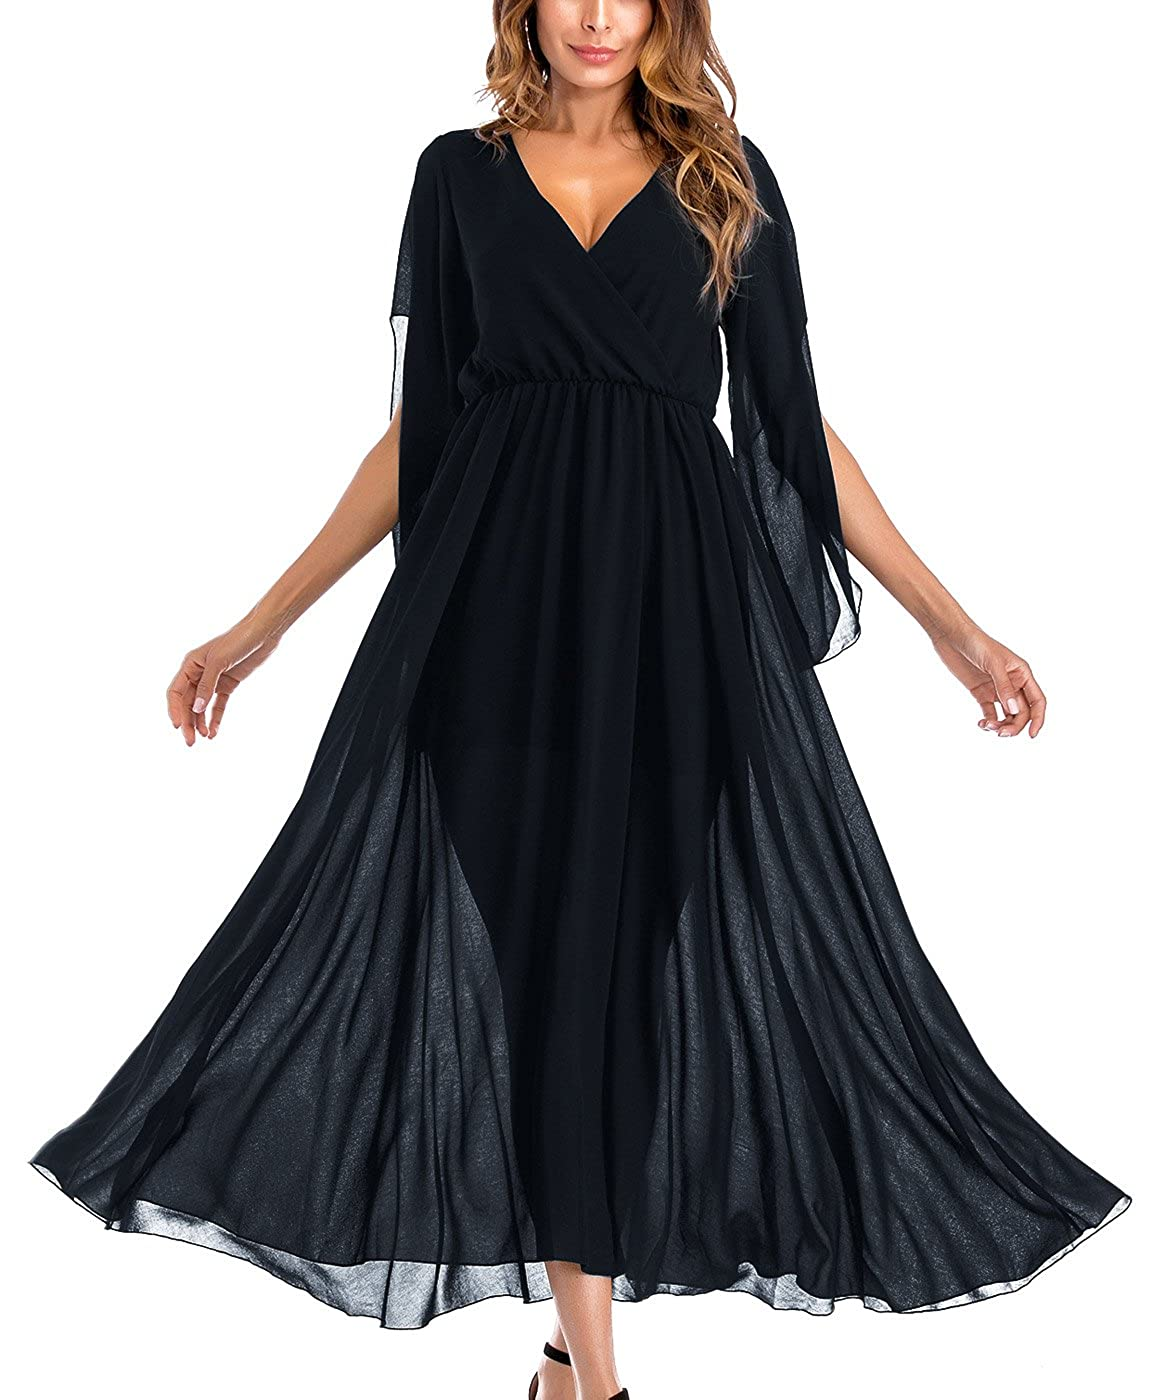 d834f1f586 FEOYA Women's Chiffon Maxi Dresses 3/4 Sleeve Evening Dresses V-Neck ...